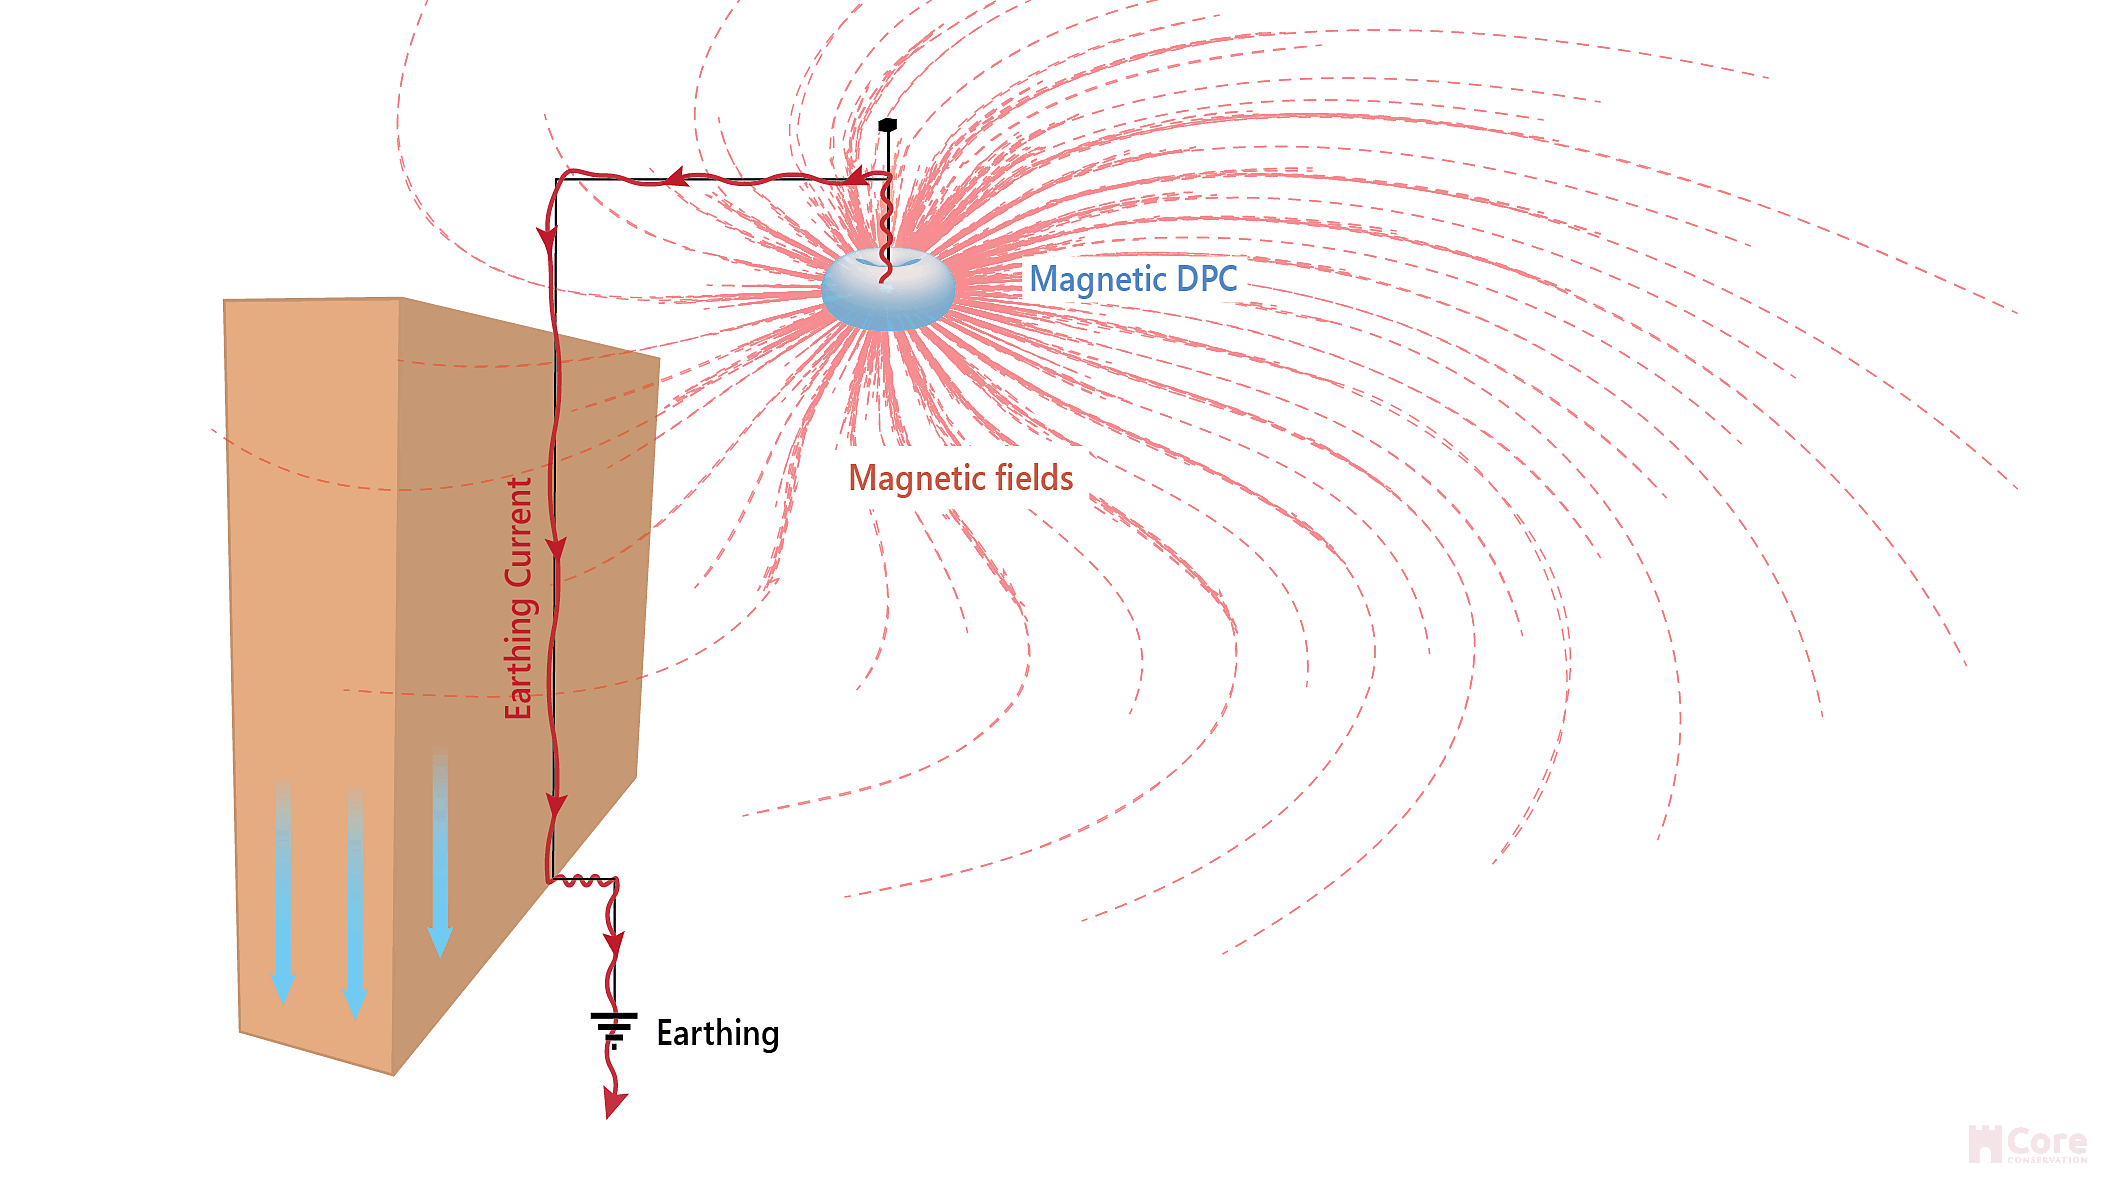 Magnetic DPC